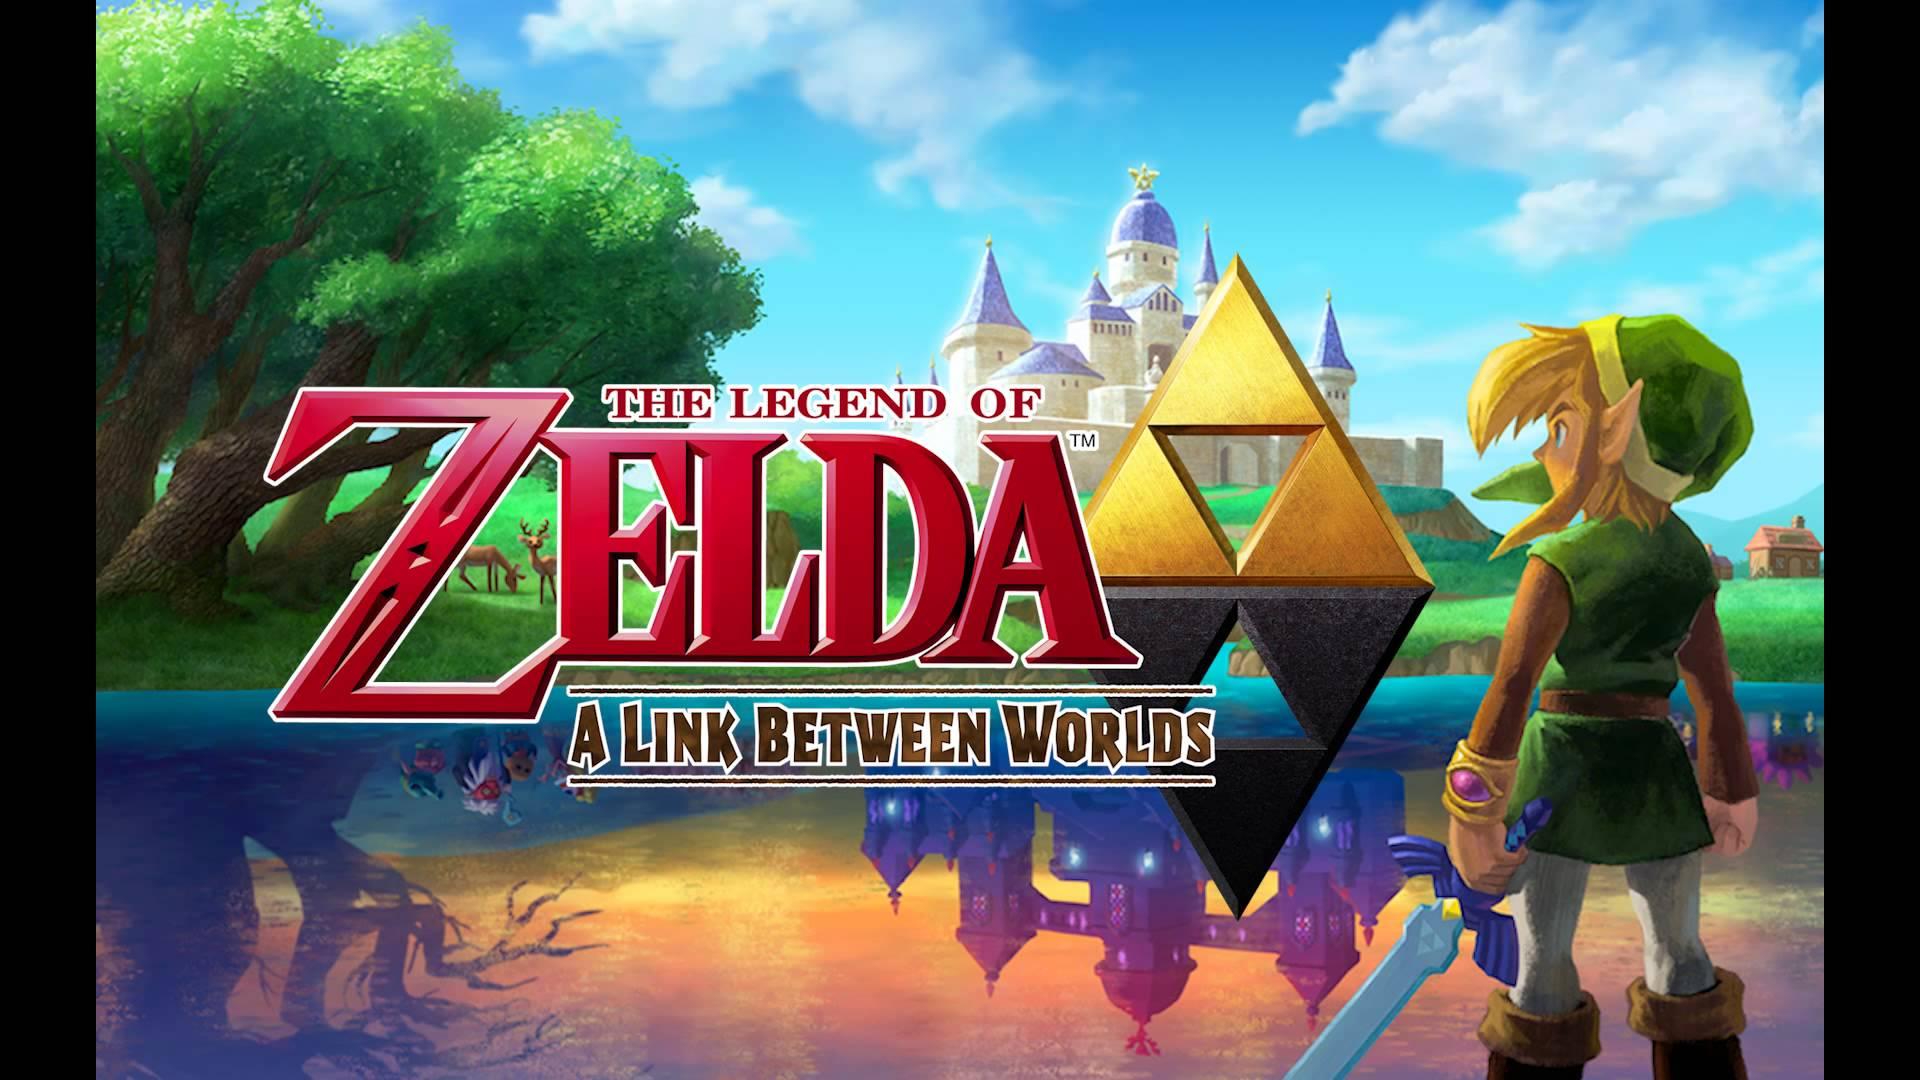 Most Viewed The Legend Of Zelda A Link Between Worlds Wallpapers